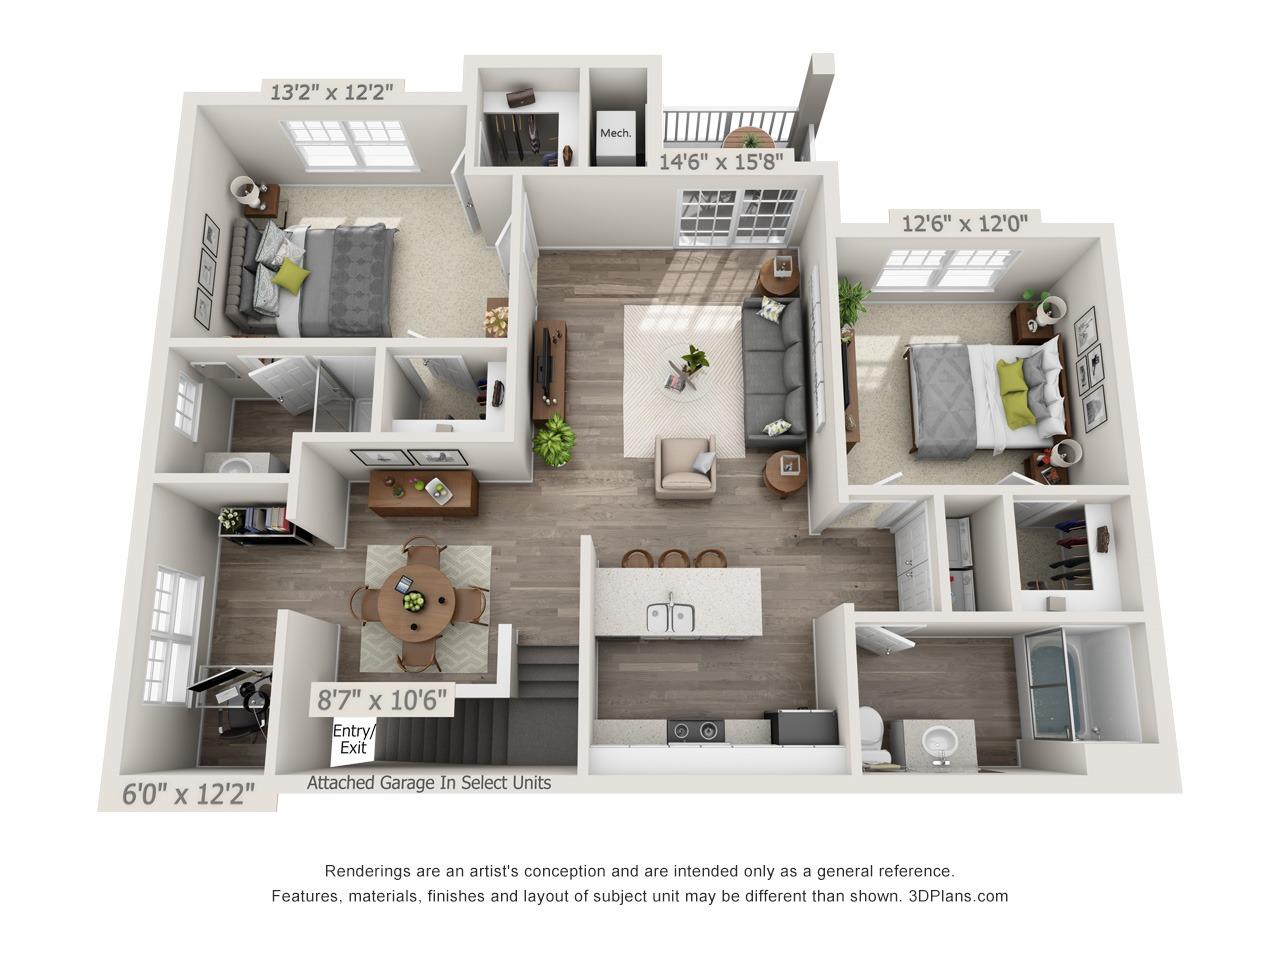 BD1 - 2 Bed / 2 Bath with Den - 2nd Floor - 1,280 SF